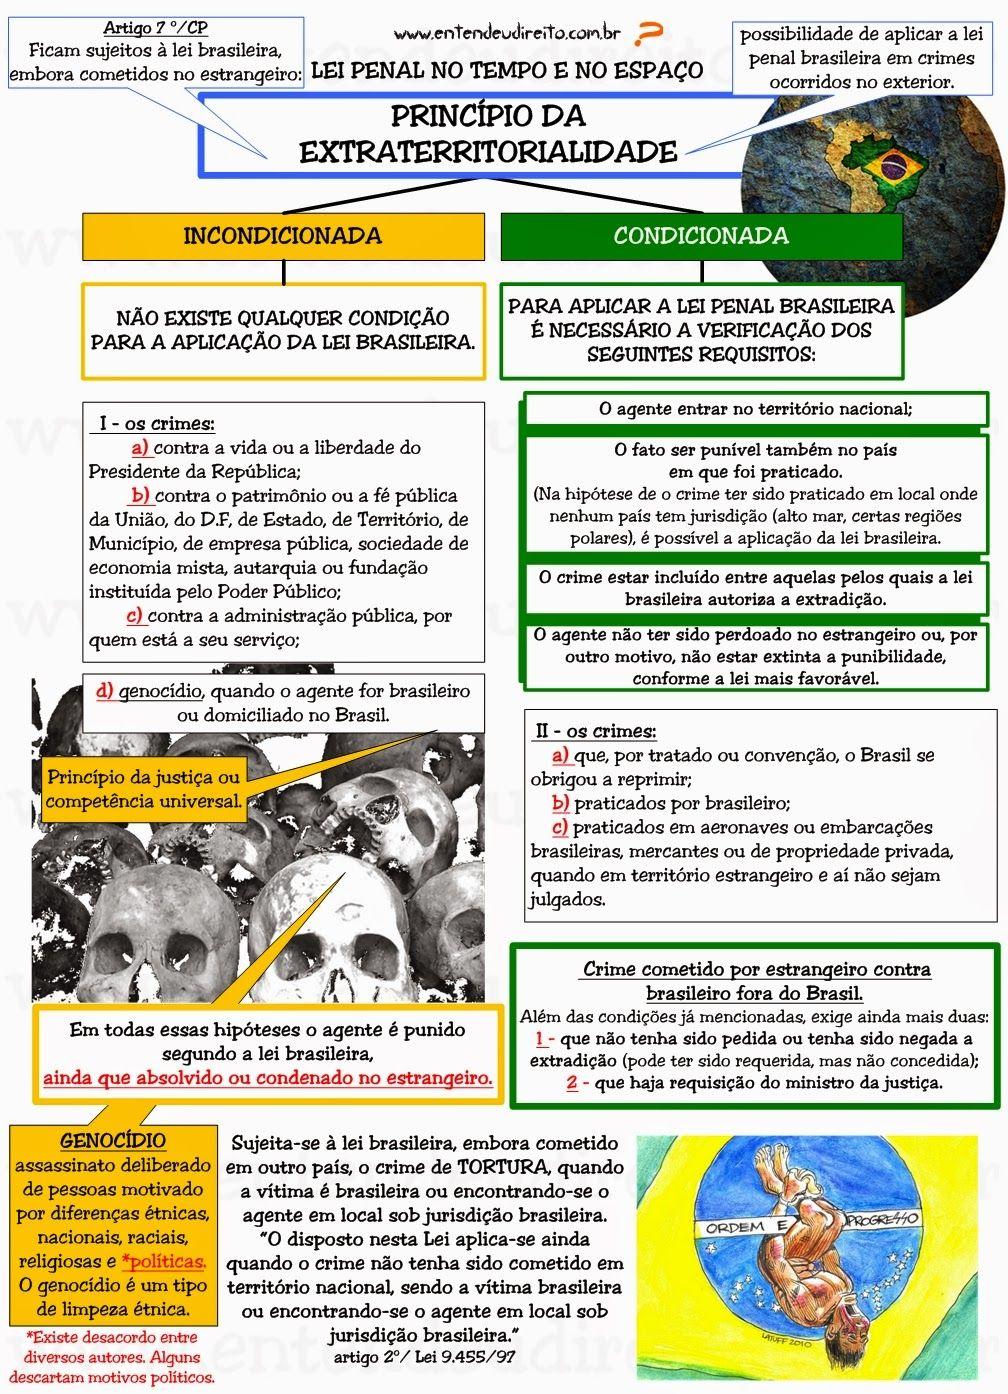 TEMPO E LUGAR DO CRIME | Direito penal, Entendeu direito